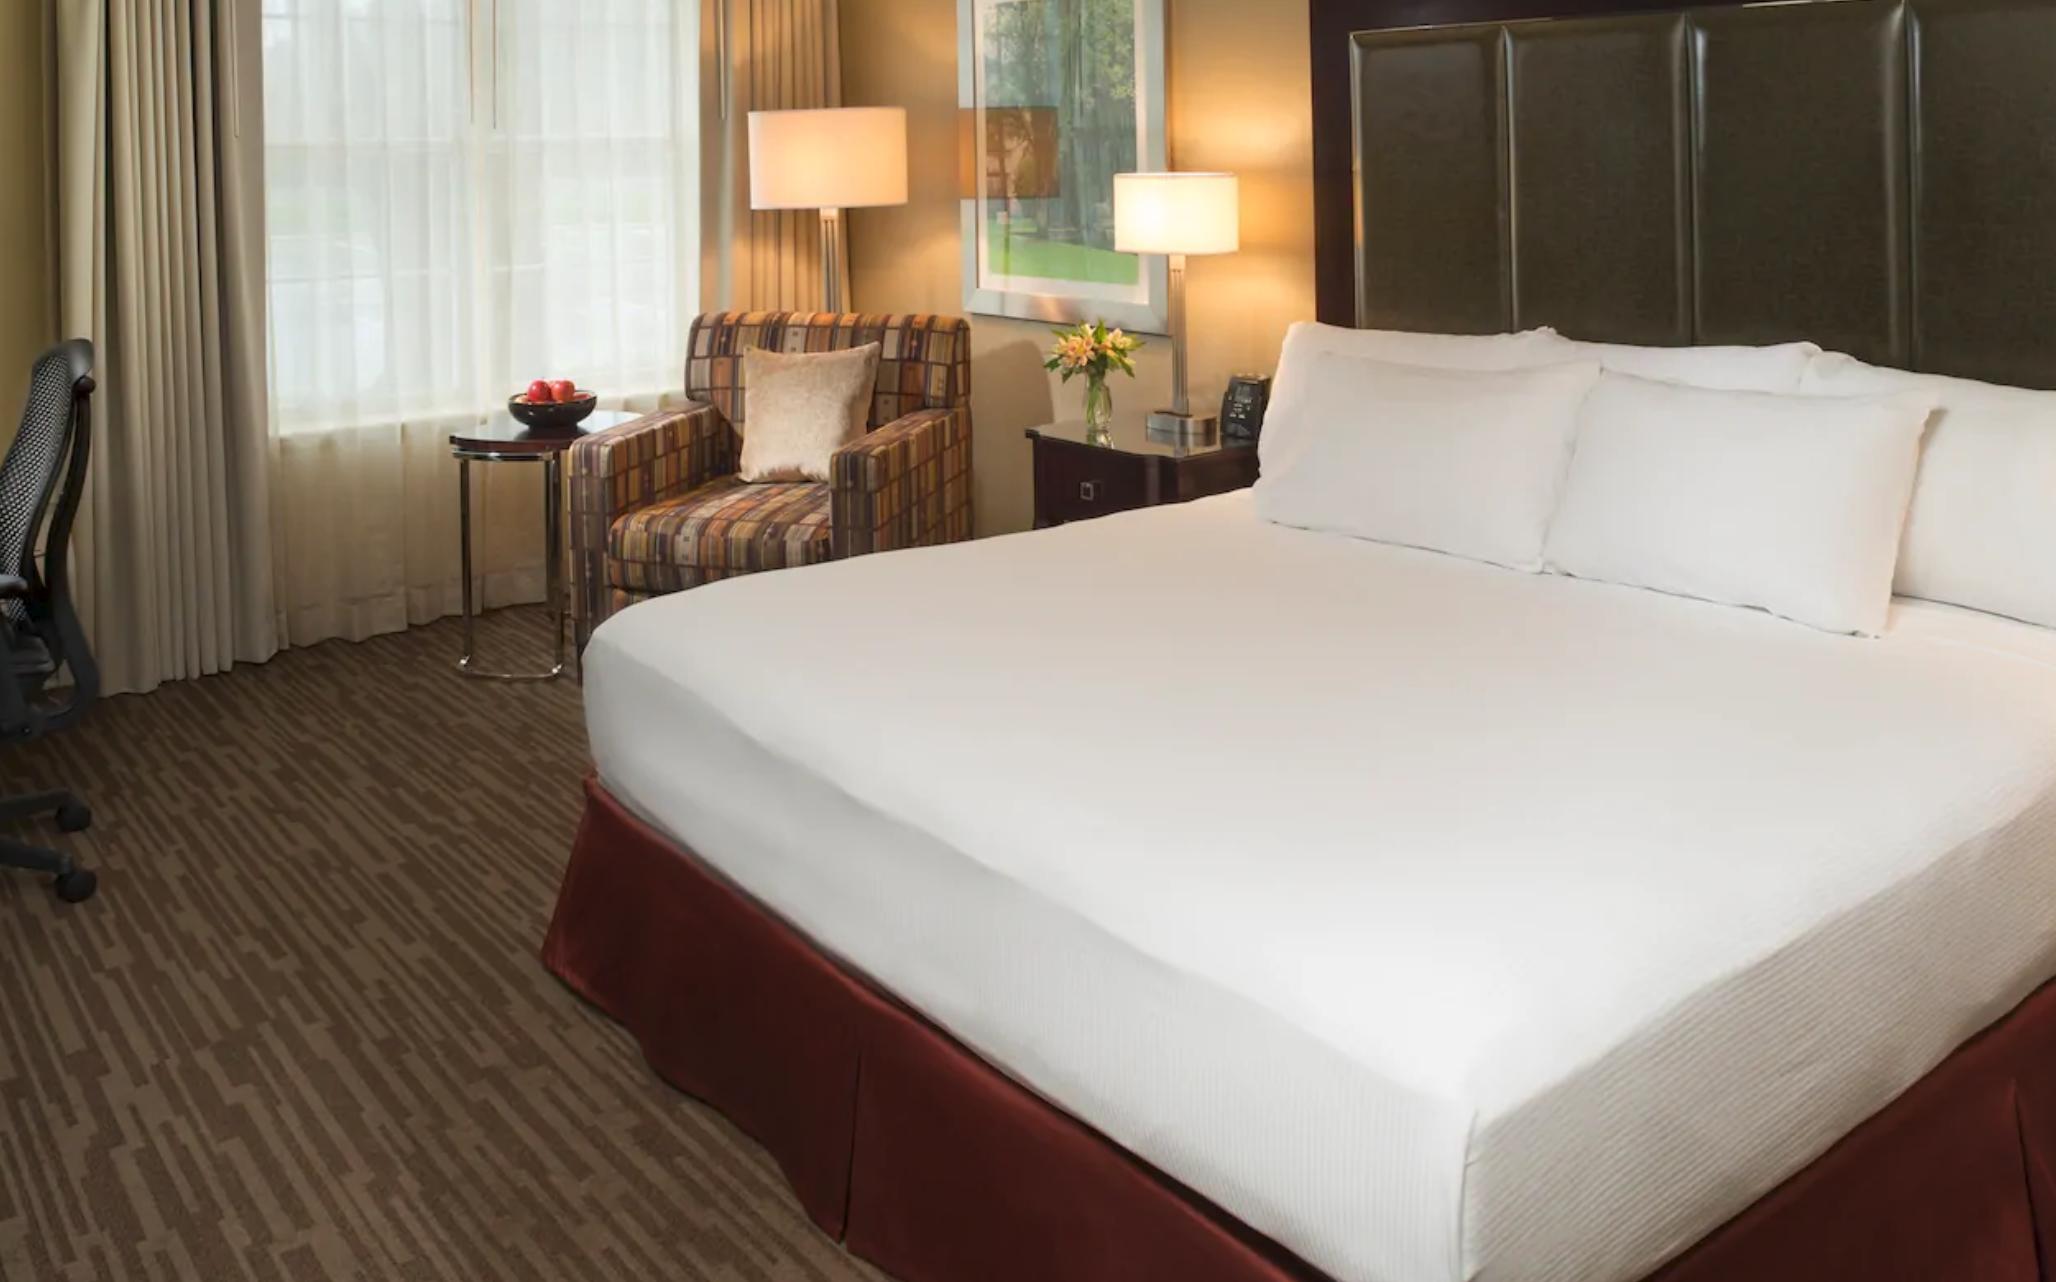 https://www.hotelsbyday.com/_data/default-hotel_image/4/20409/screenshot-2020-08-13-at-9-58-35-am.png